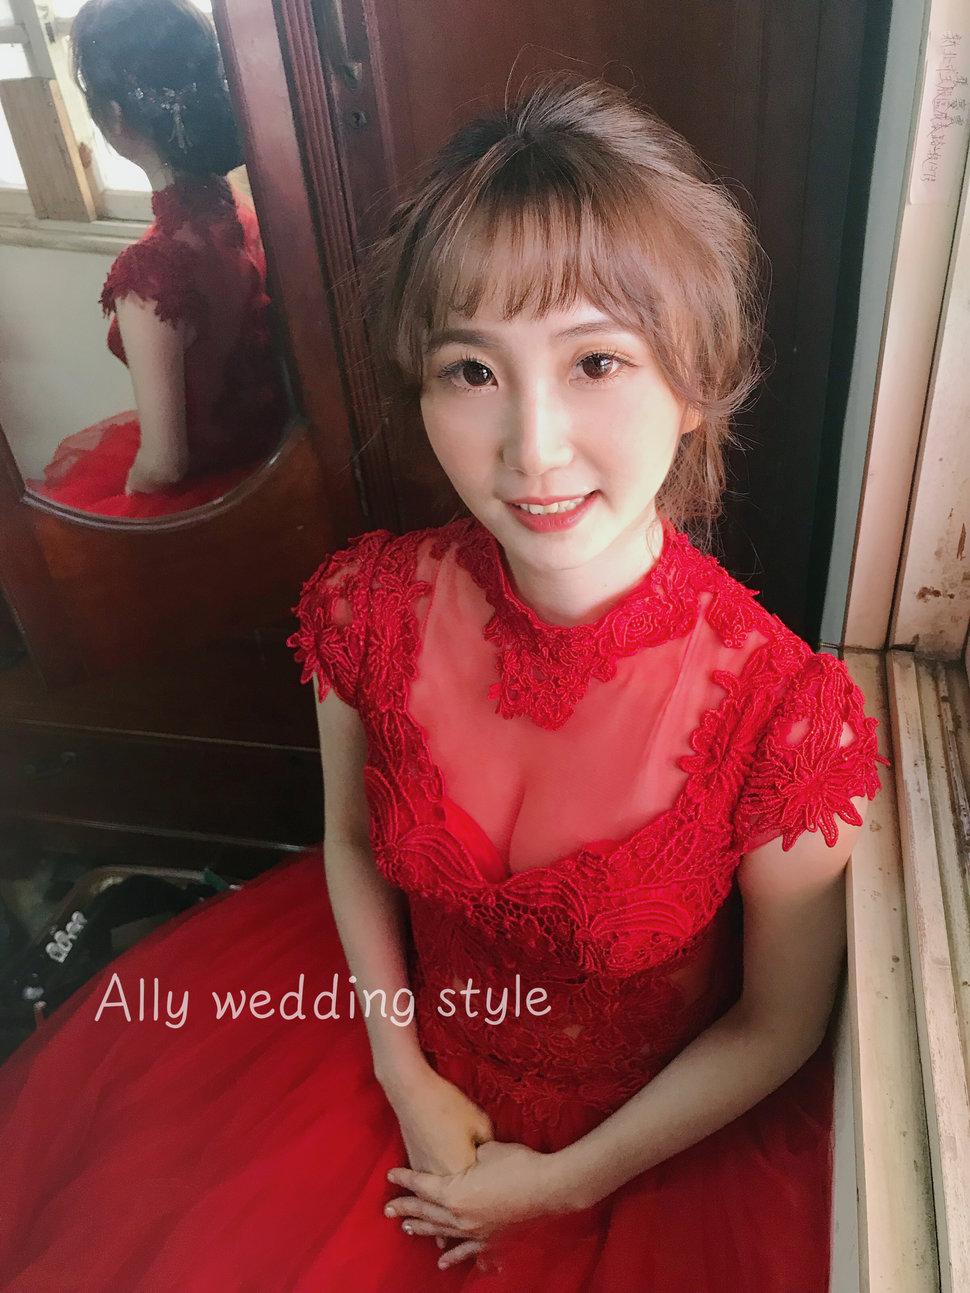 17FDA58F-9BF6-41A1-AA75-2A1A8372C5A1 - 台中高雄新娘秘書Ally Chen《結婚吧》